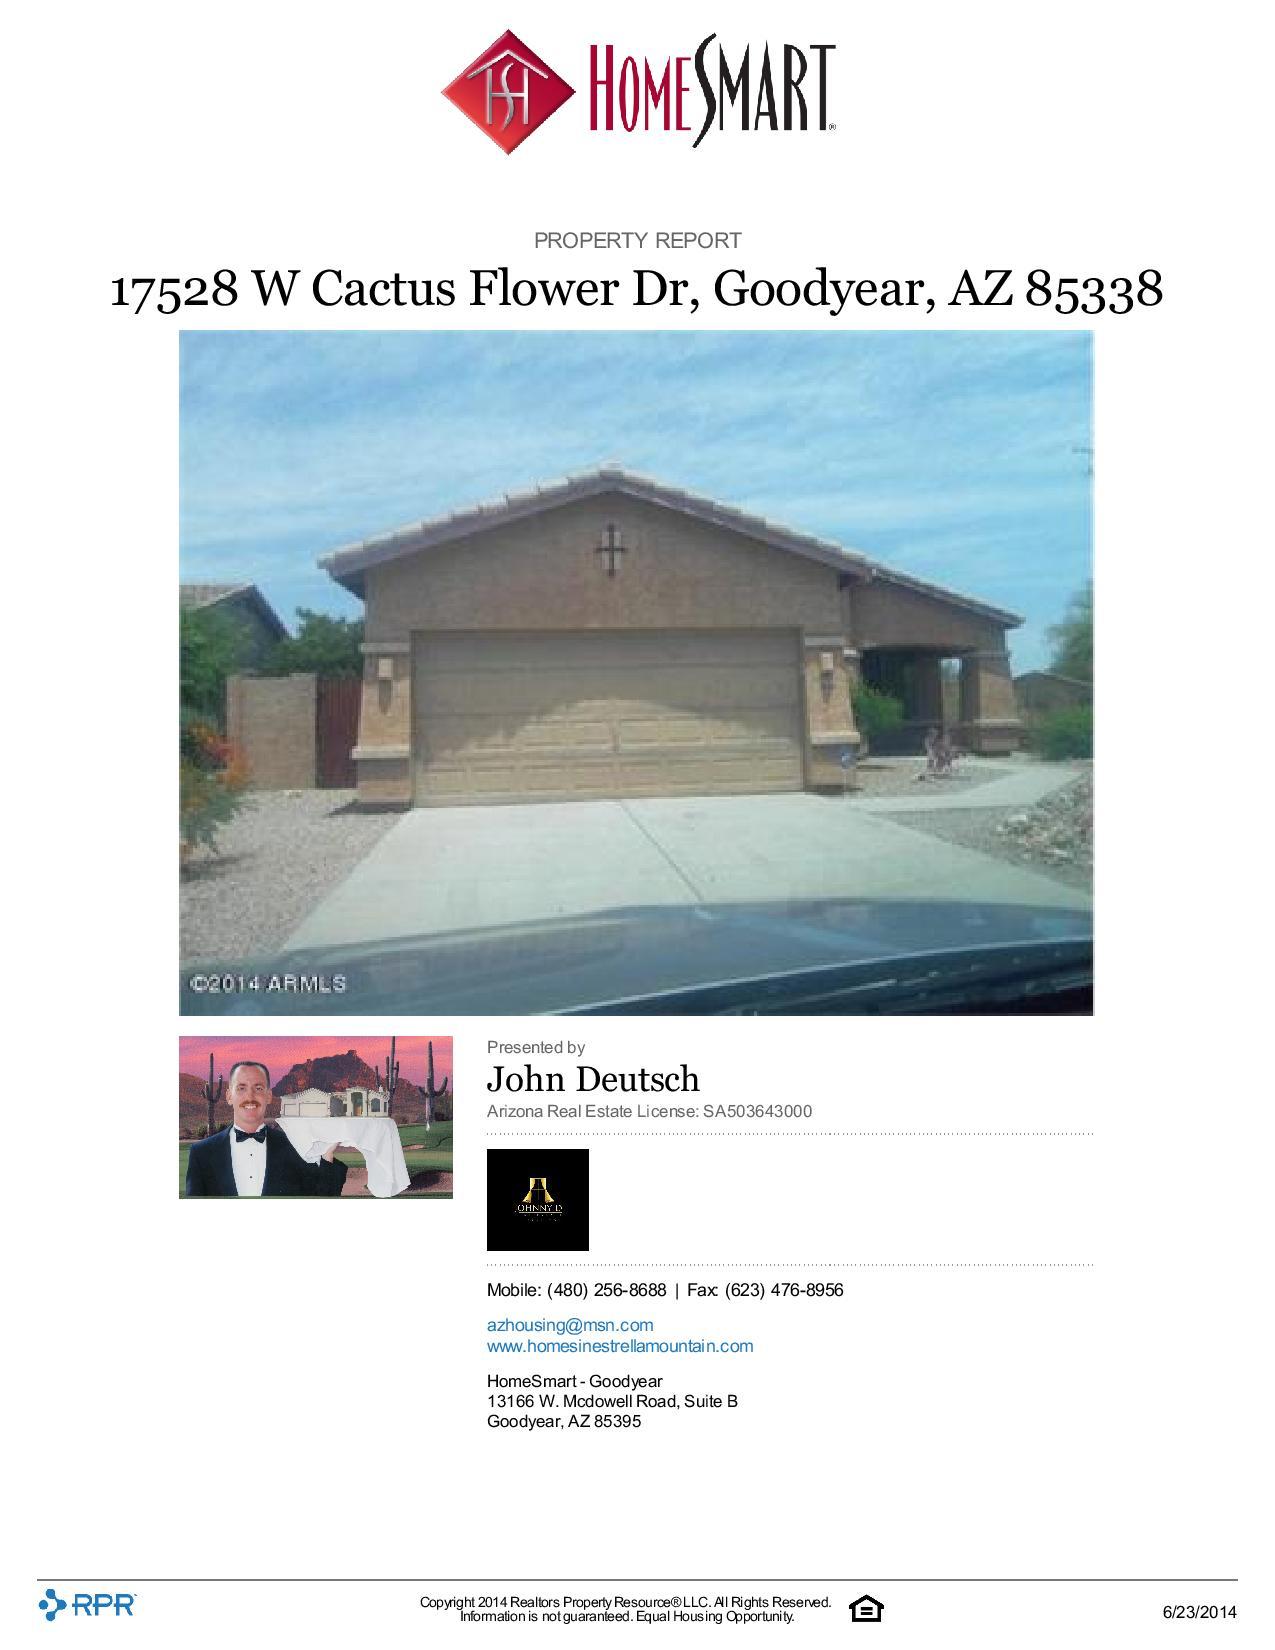 17528-W-Cactus-Flower-Dr-Goodyear-AZ-85338-page-001